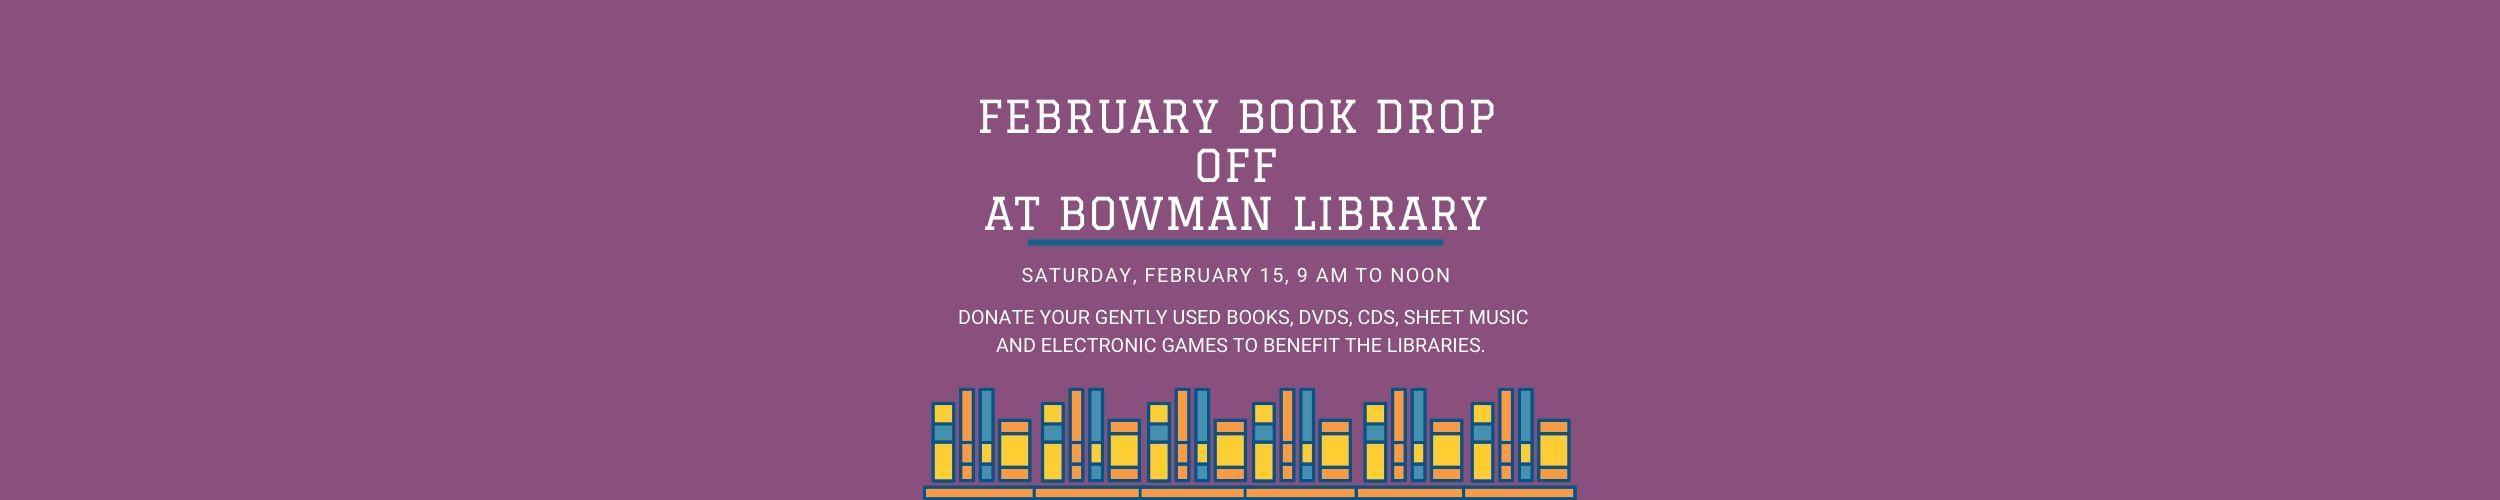 February Book Drop Off